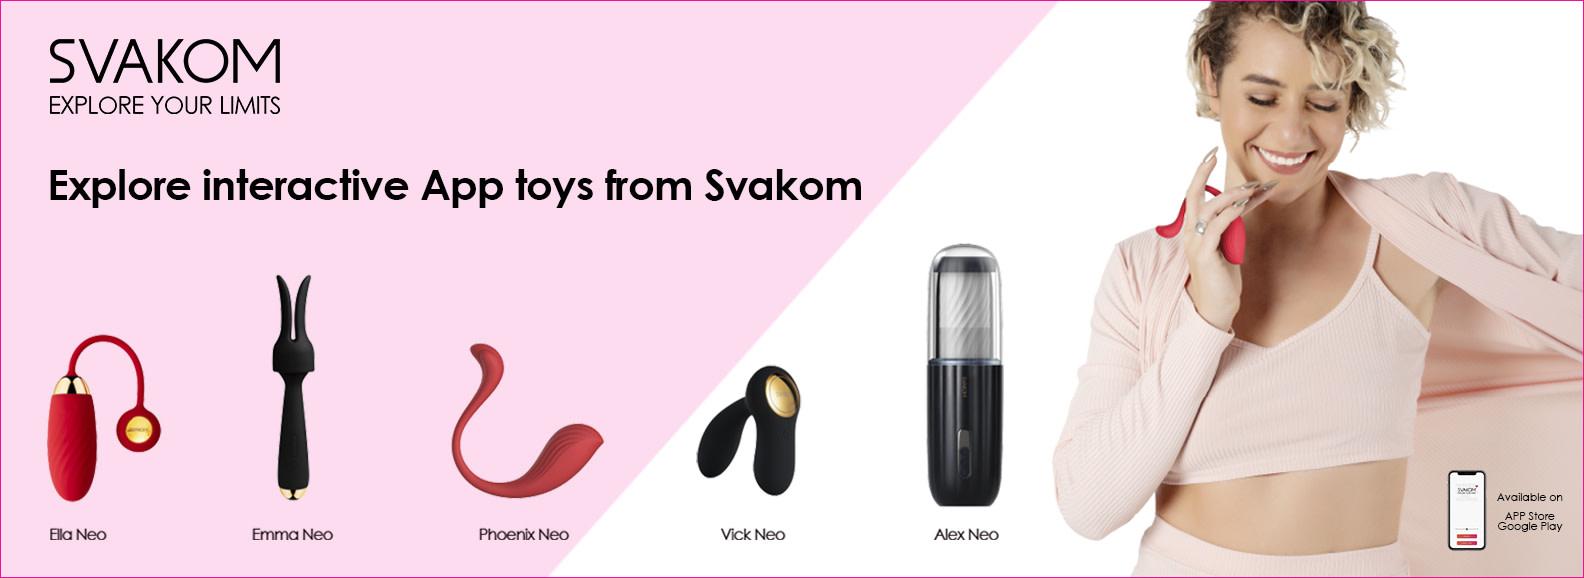 Svakom Products